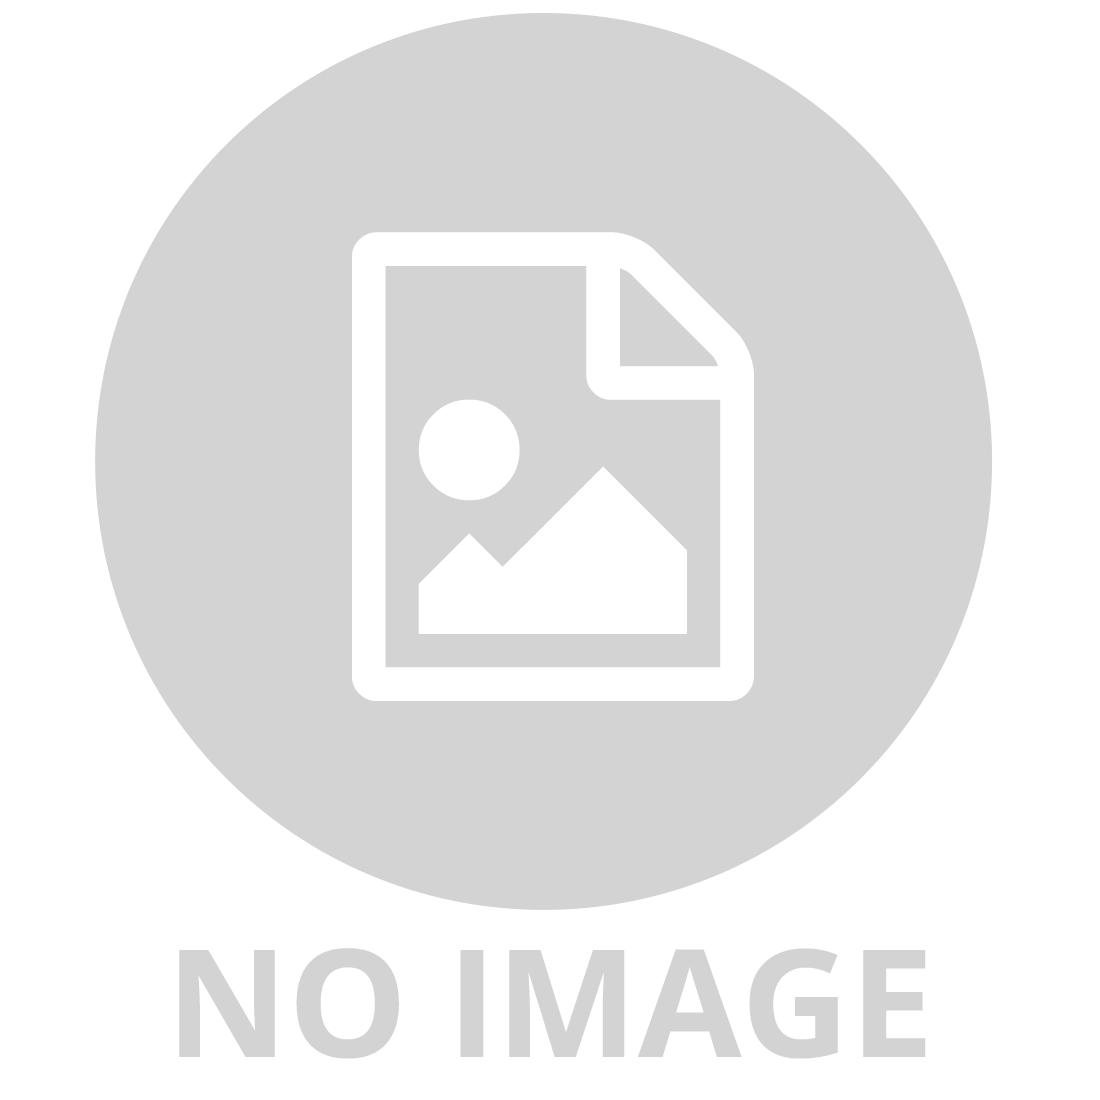 BAT KITE SINGLE STRING